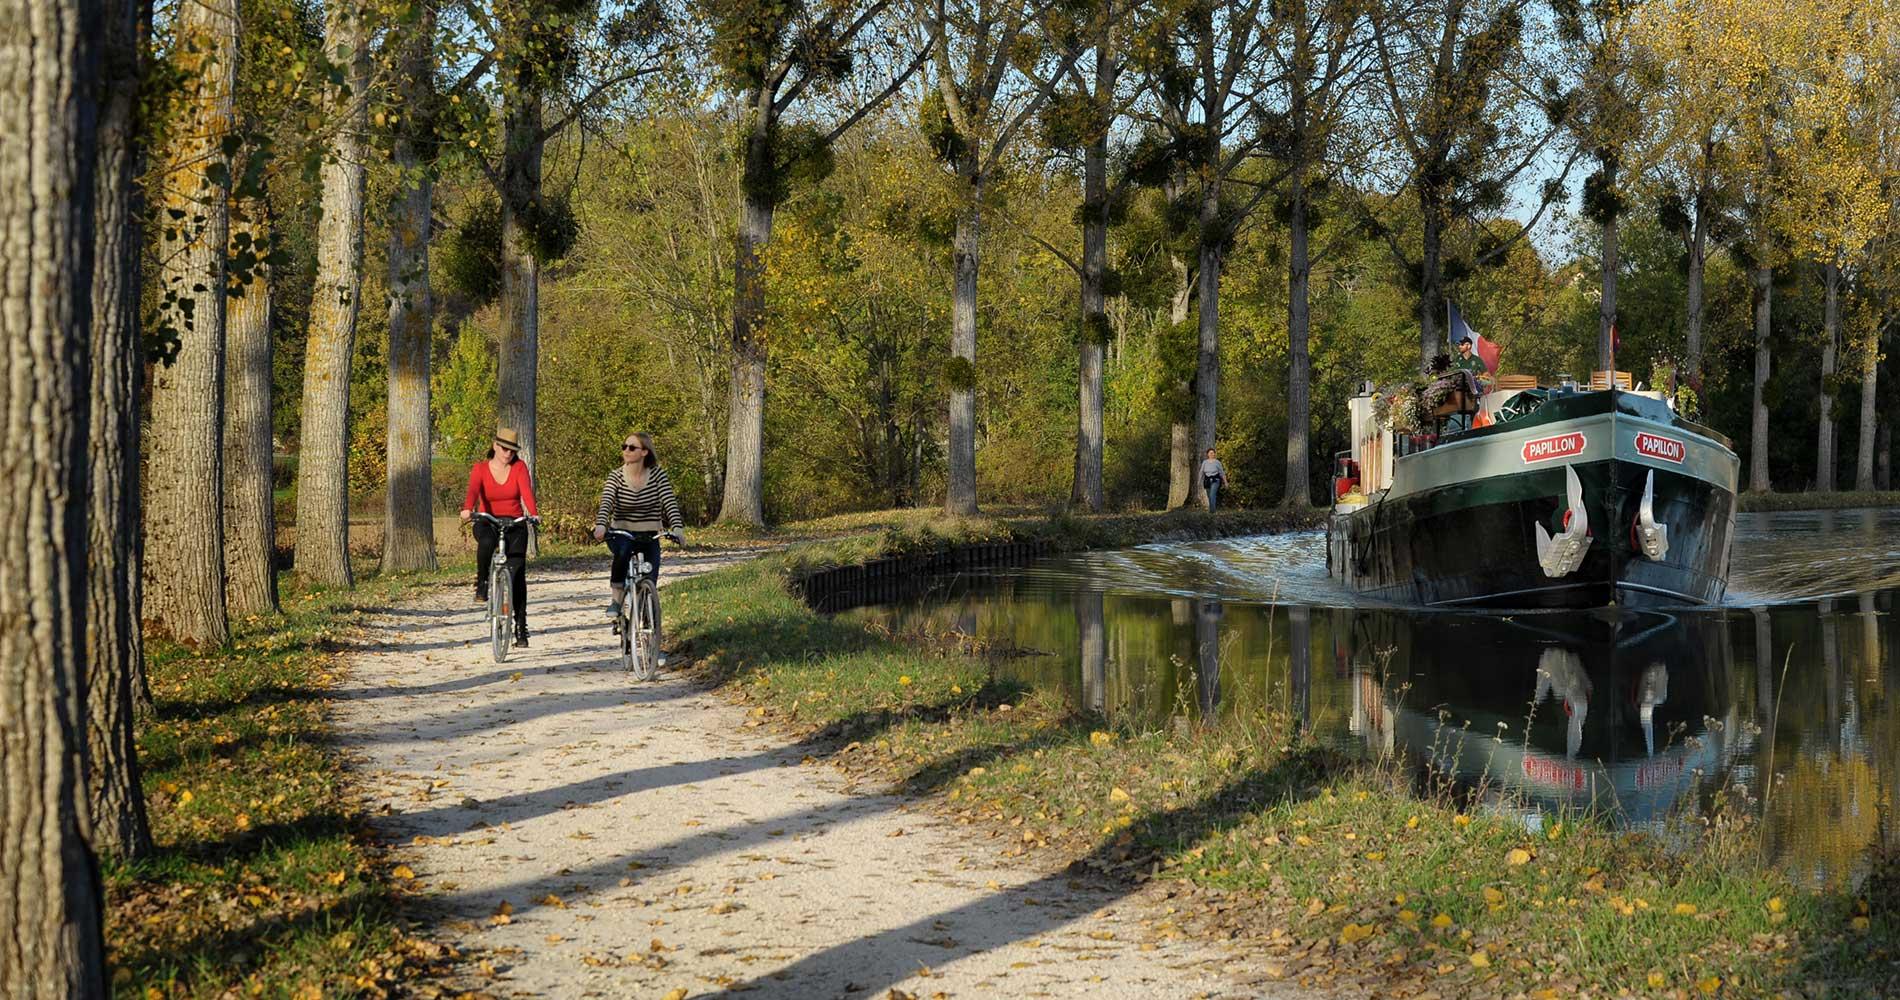 Papillon cruising and cycling